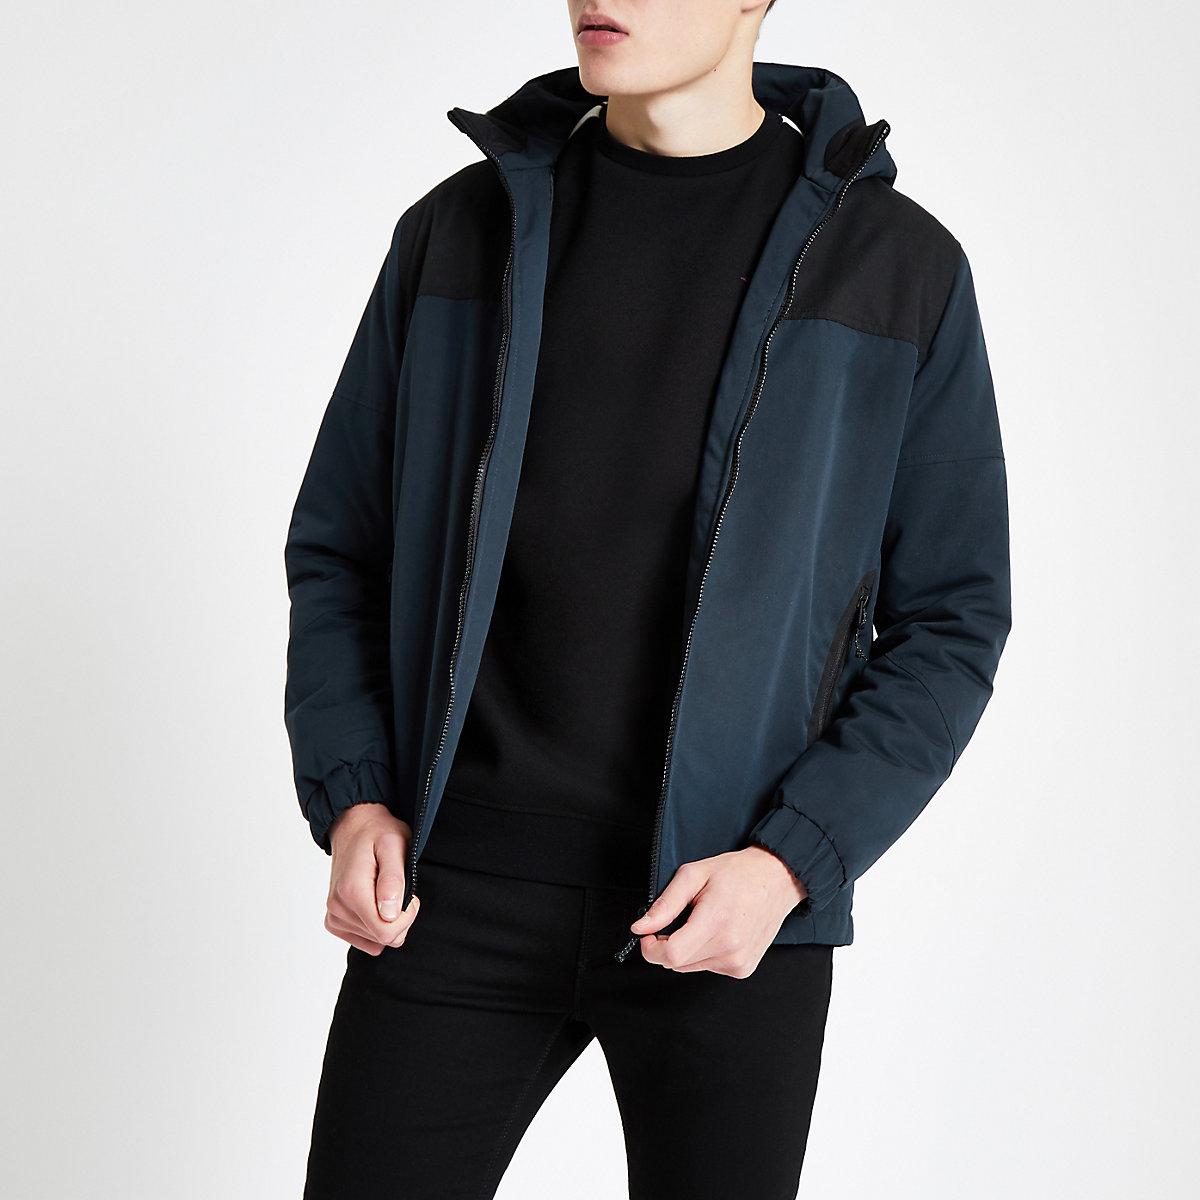 Jack & Jones – Marineblaue Jacke mit Reißverschluss